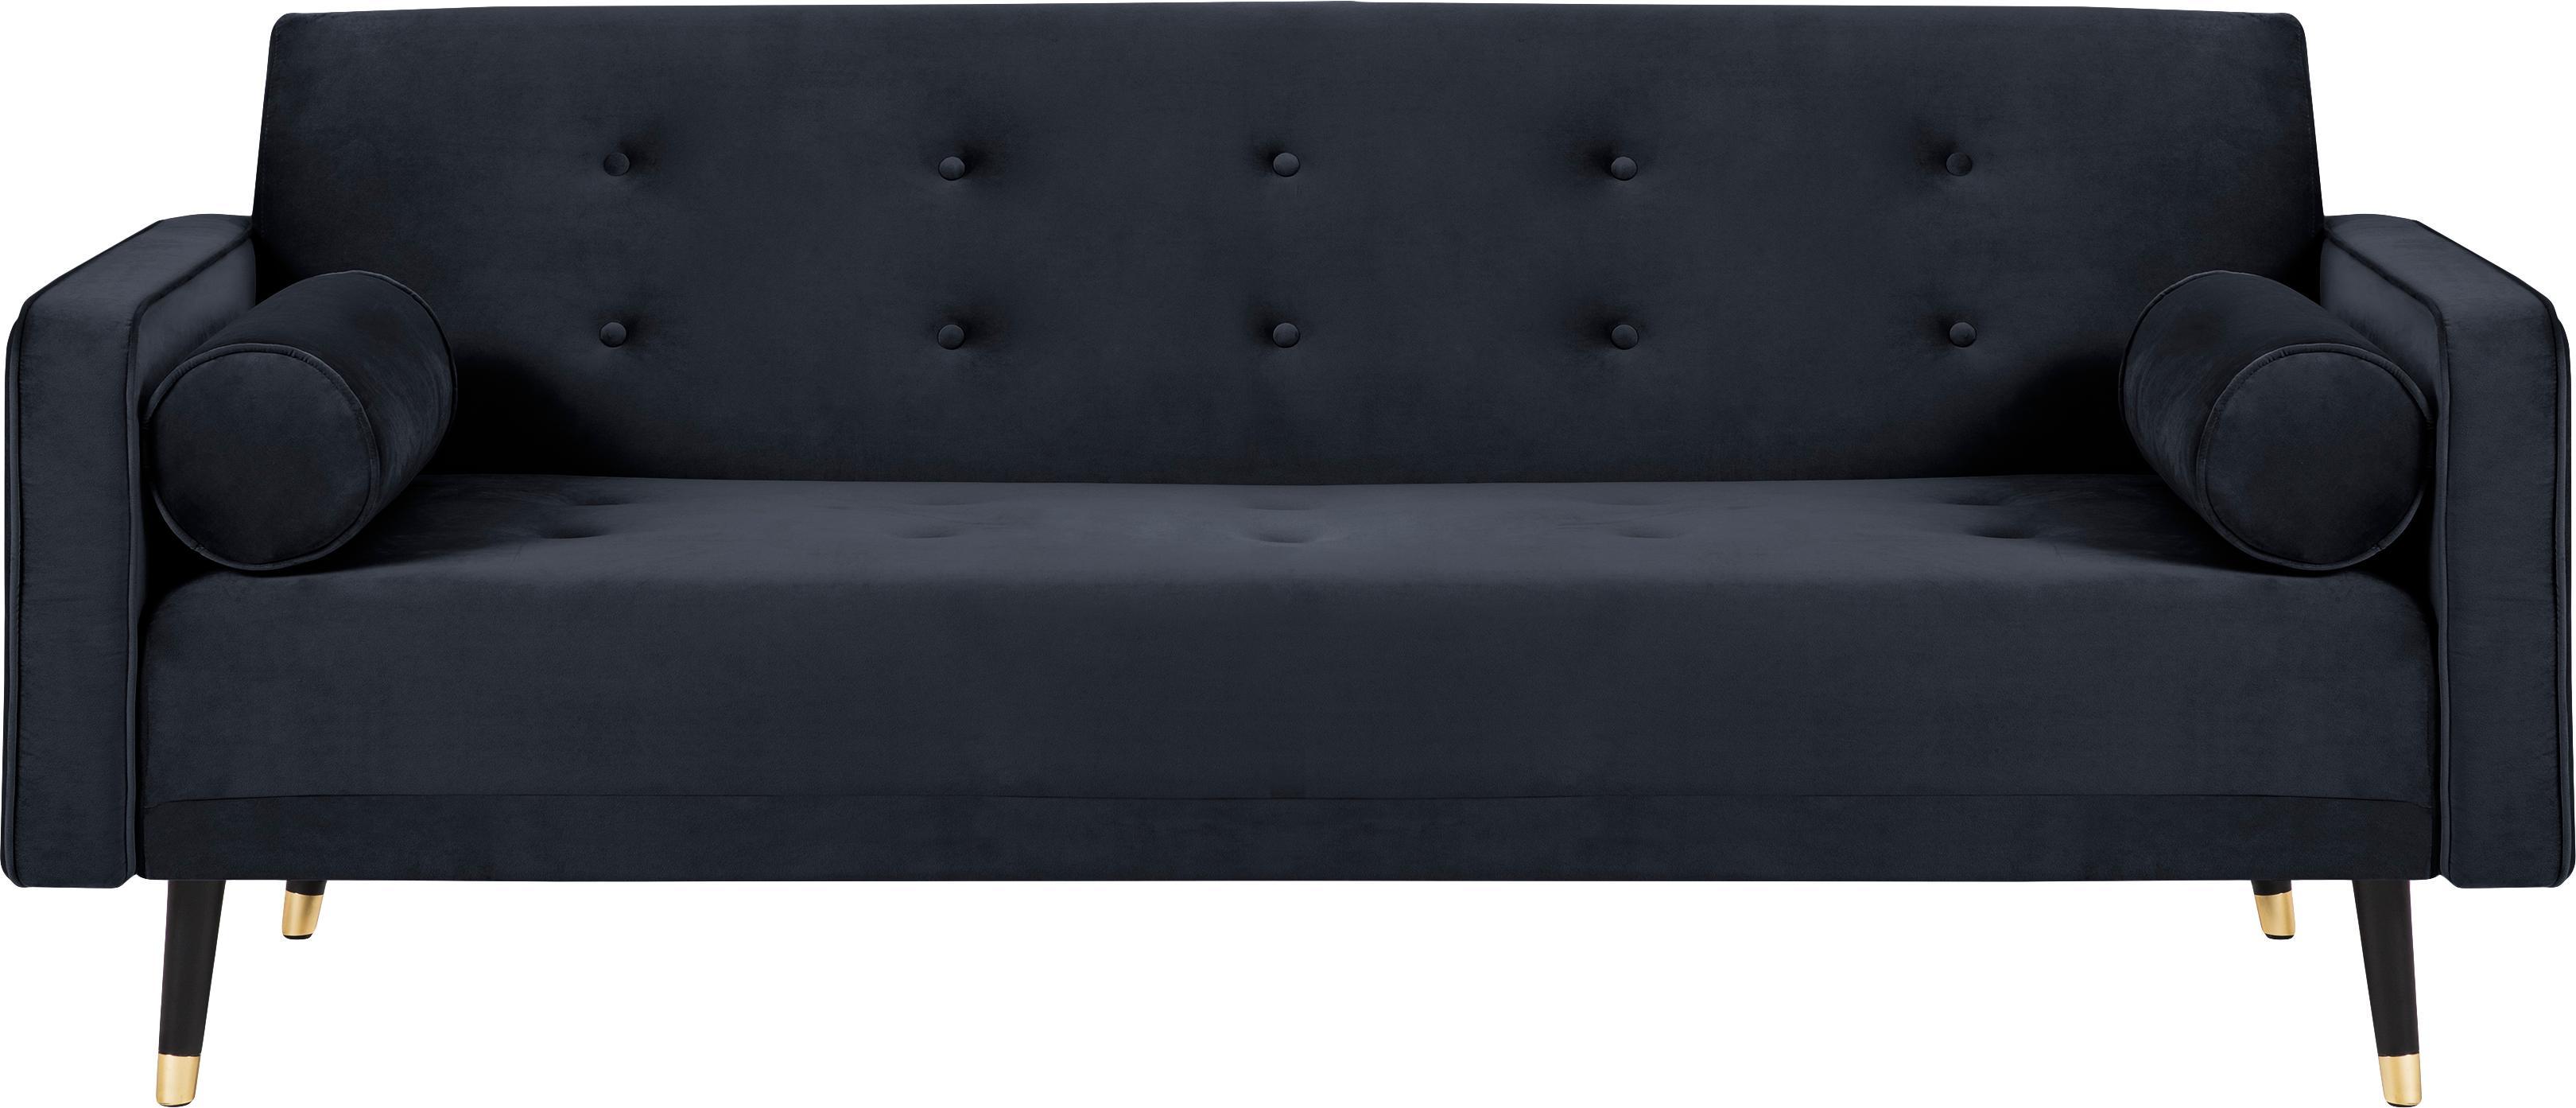 Samt-Schlafsofa Gia (3-Sitzer), Bezug: Polyestersamt Der strapaz, Rahmen: Massives Kiefernholz, Korpus: Spanplatte, Sperrholz, Sp, Samt Blau, B 212 x T 93 cm